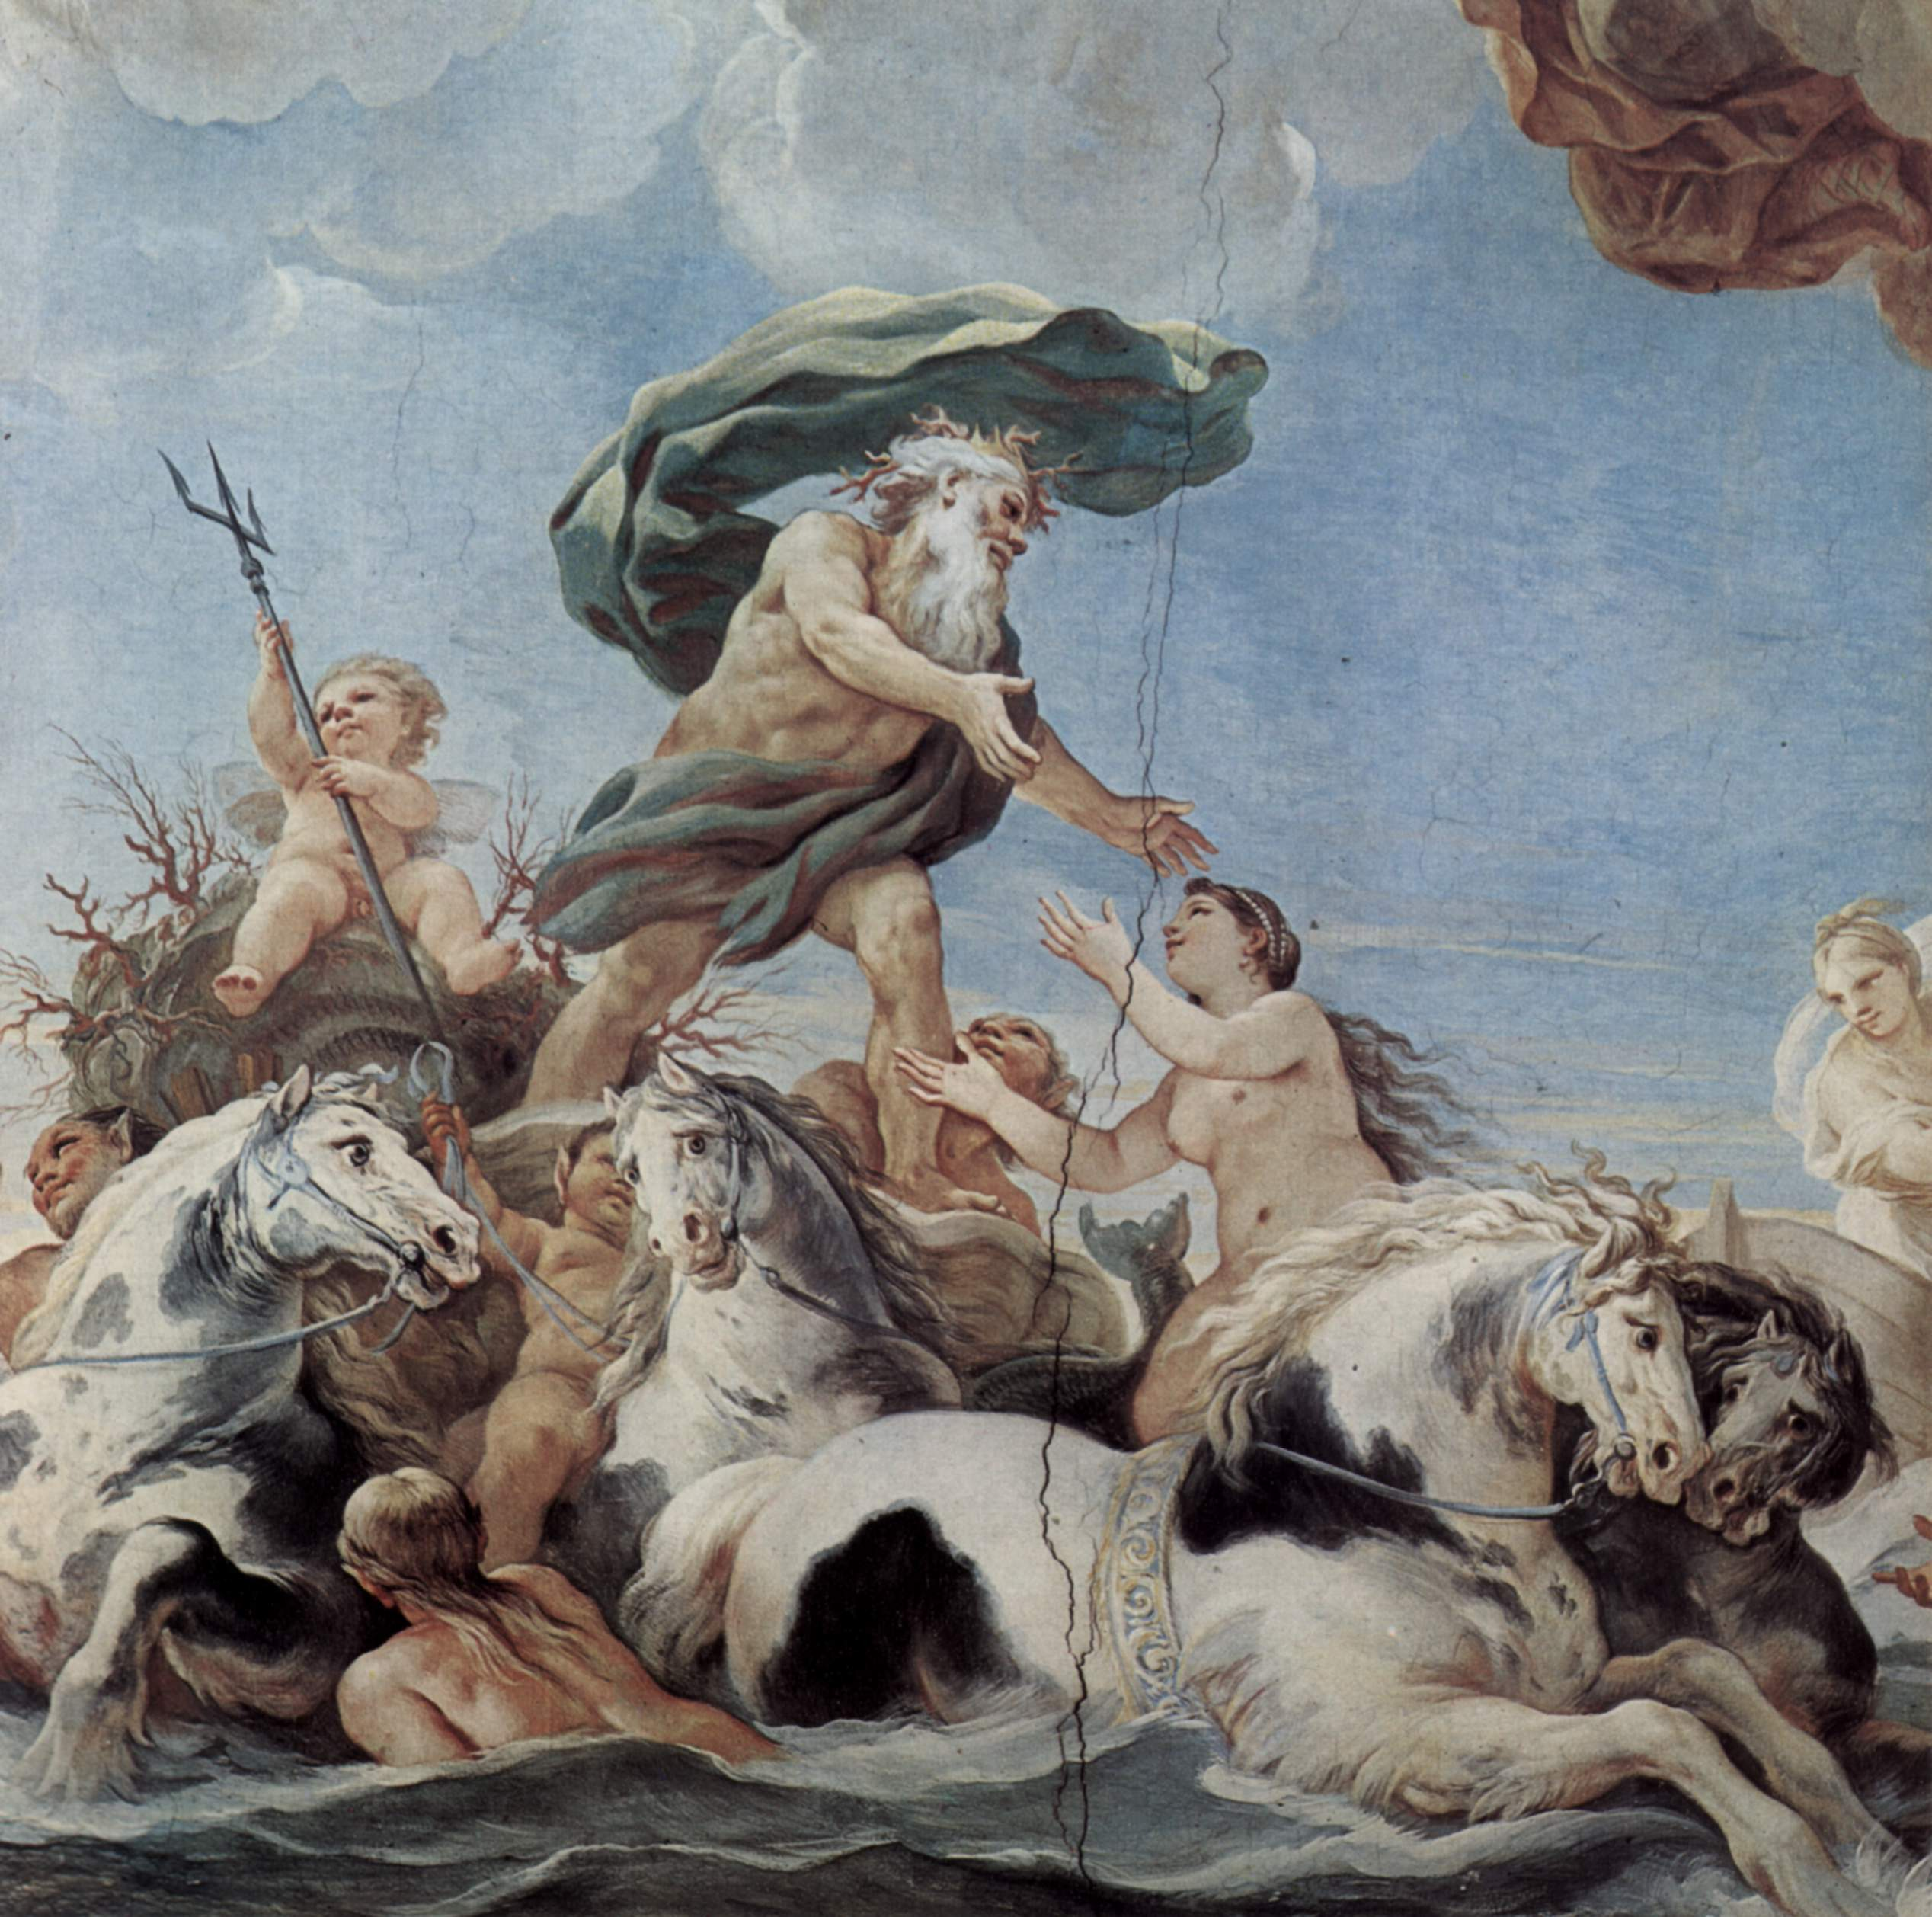 Триумфальная процессия Нептуна, Джордано Лука